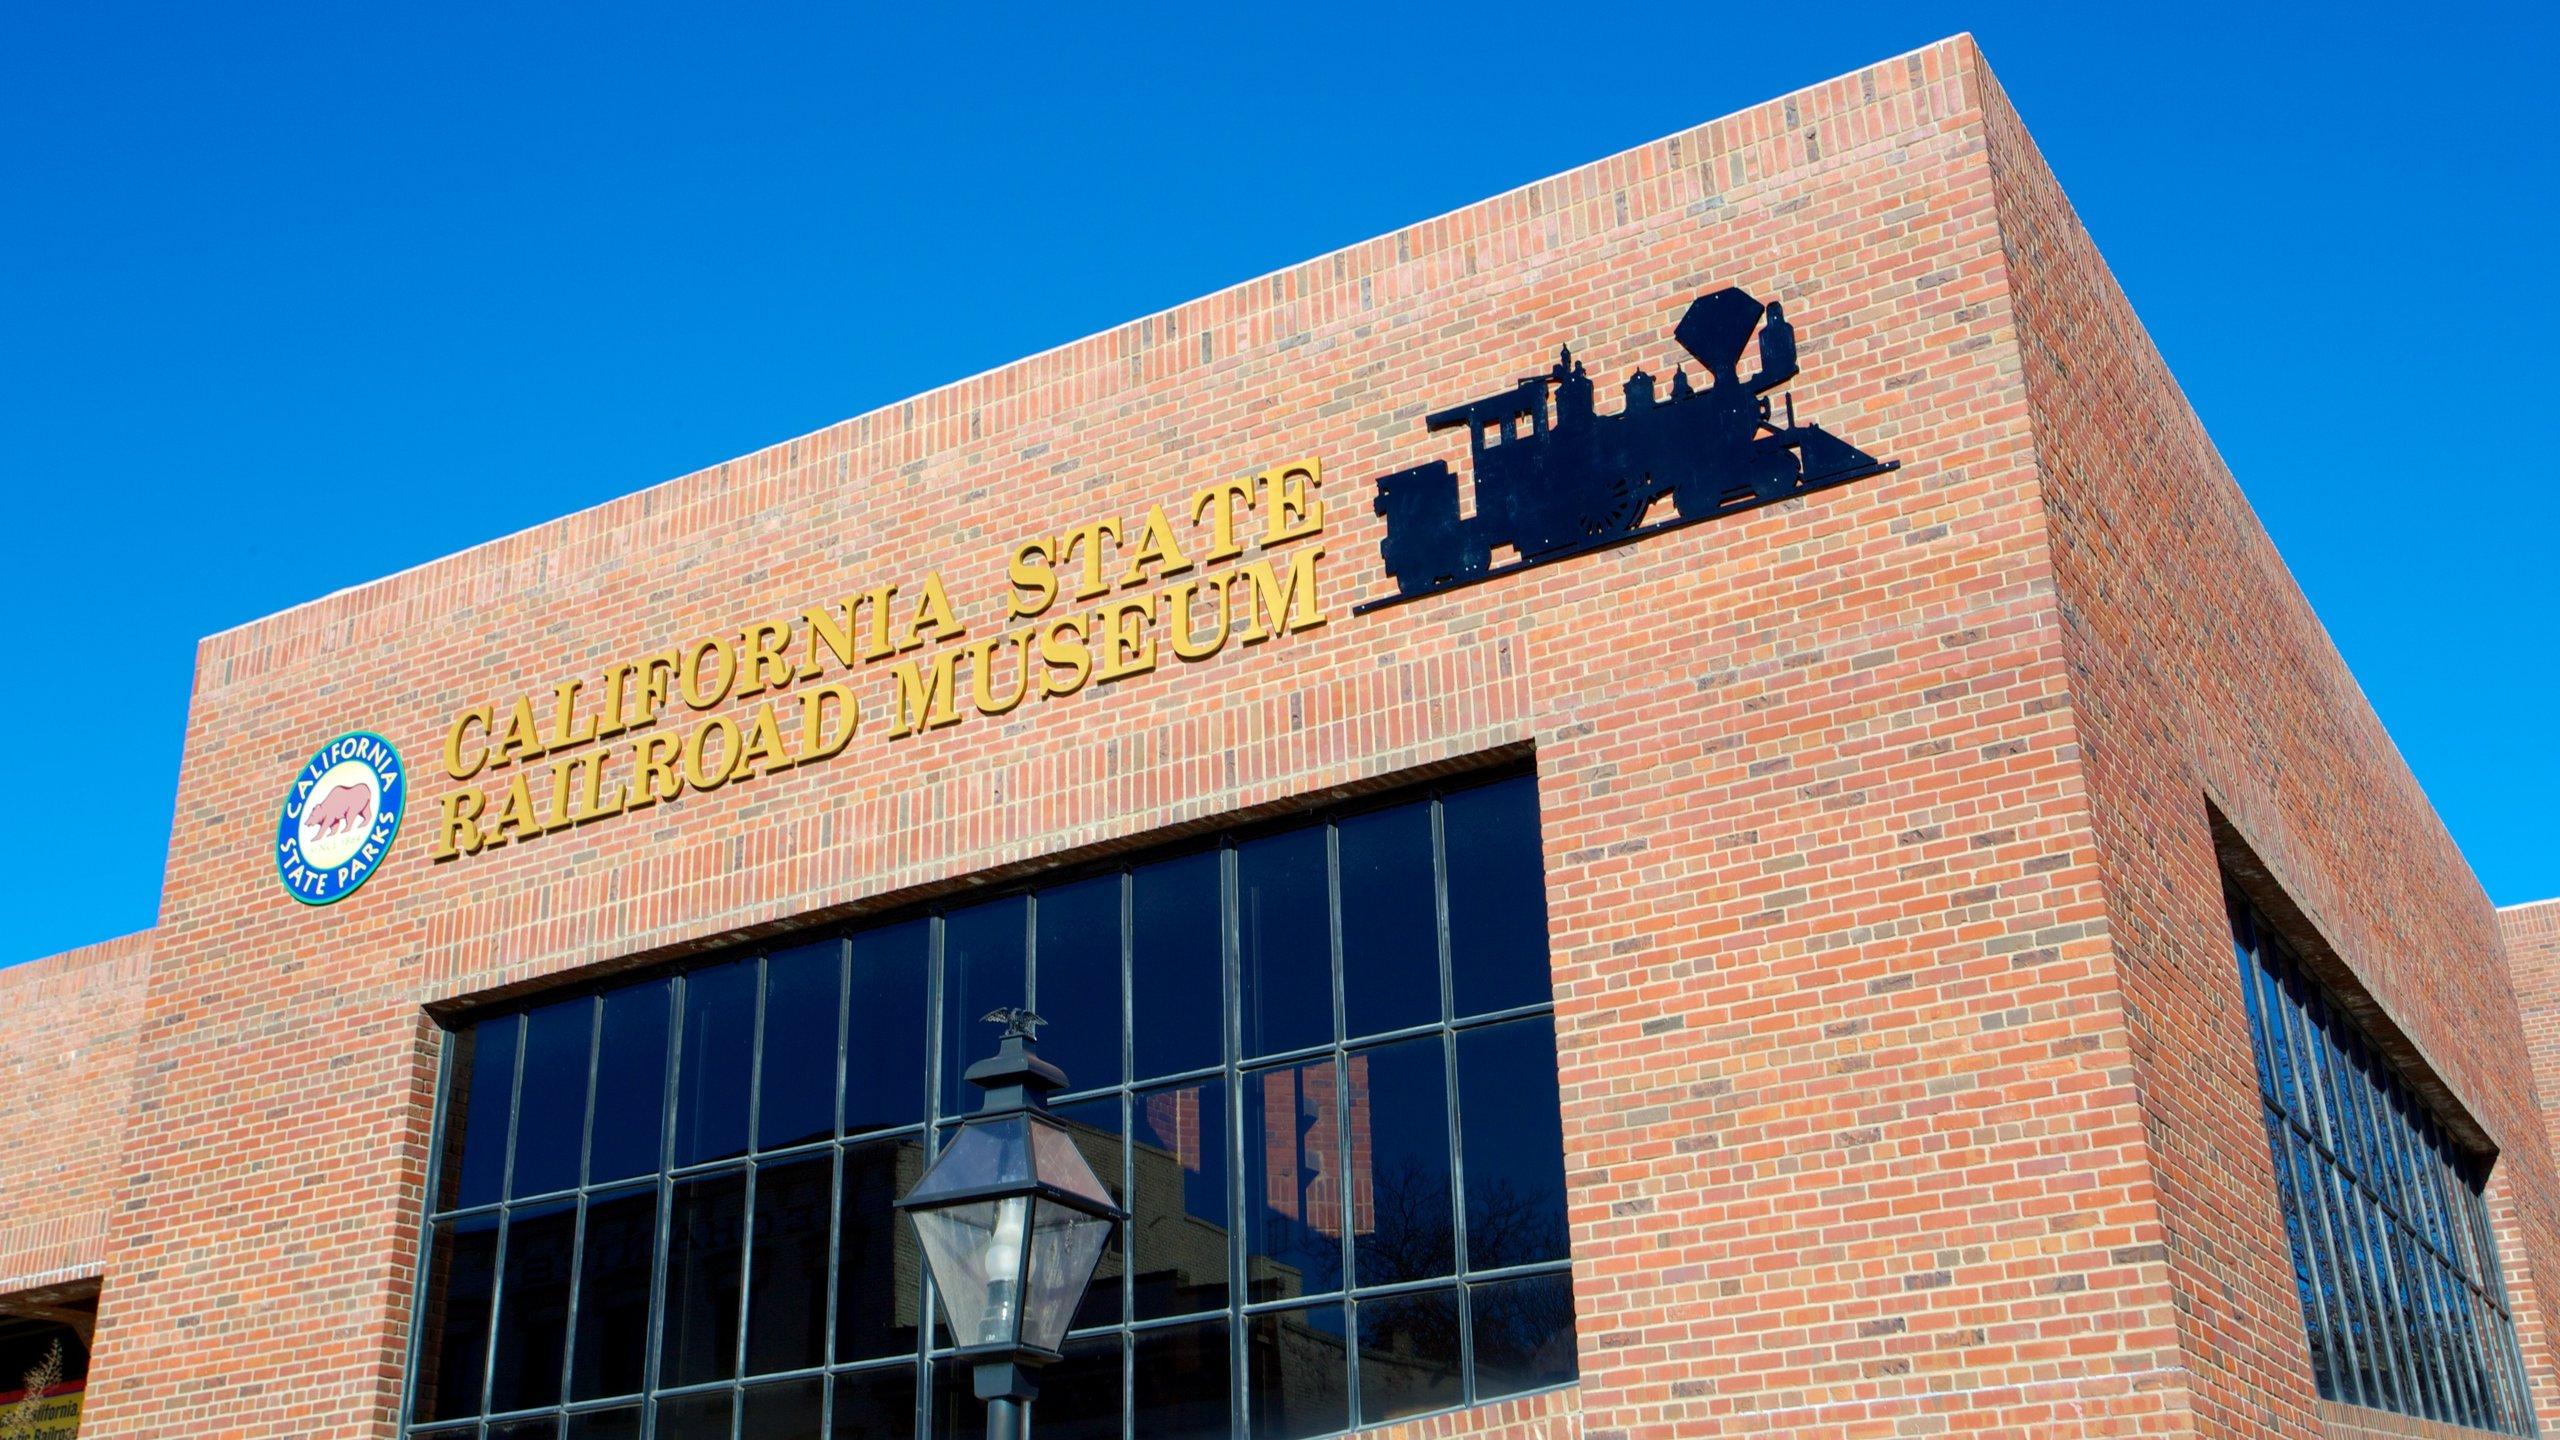 California State Railroad Museum, Sacramento, Californië, Verenigde Staten